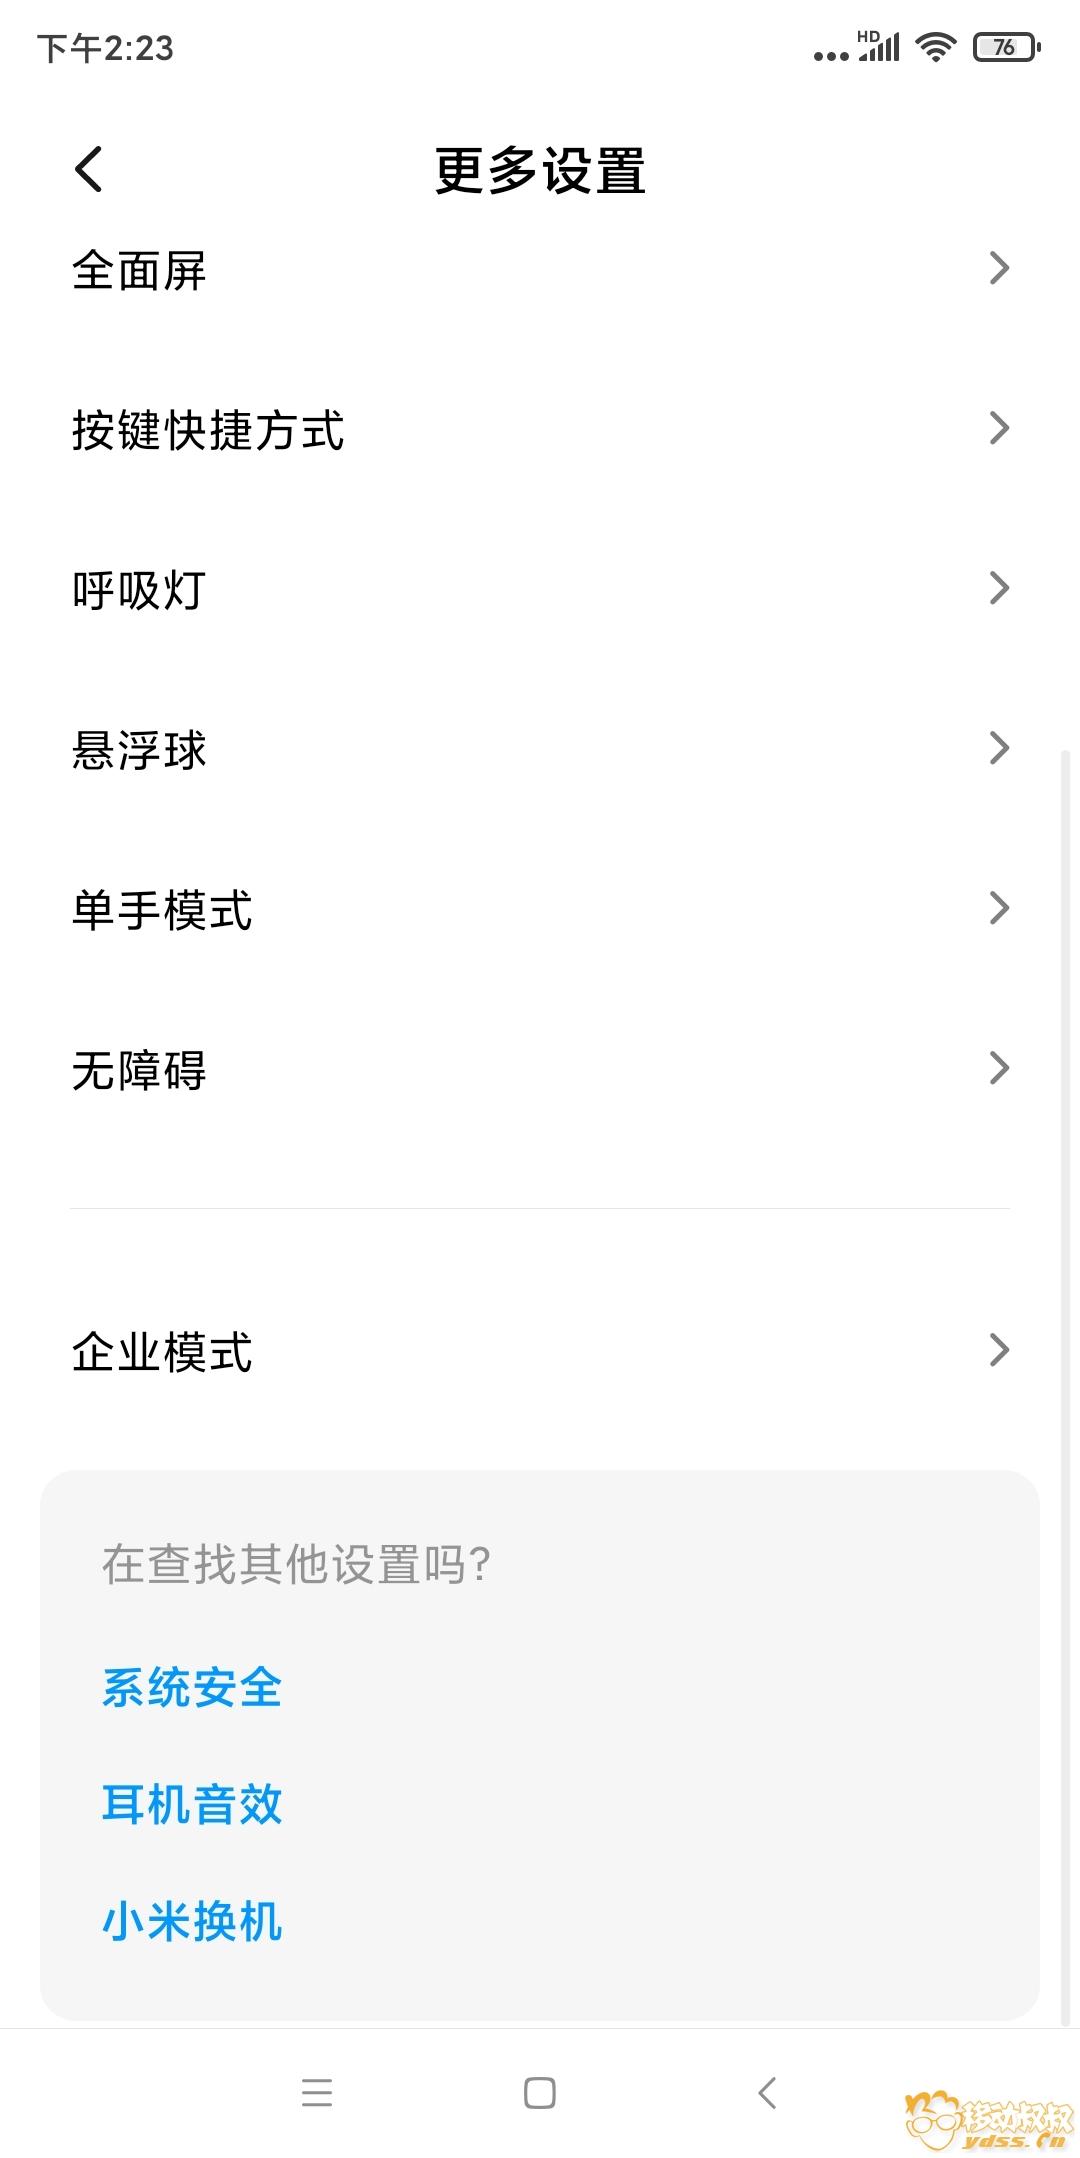 Screenshot_2019-11-13-14-23-51-452_com.android.settings.jpg